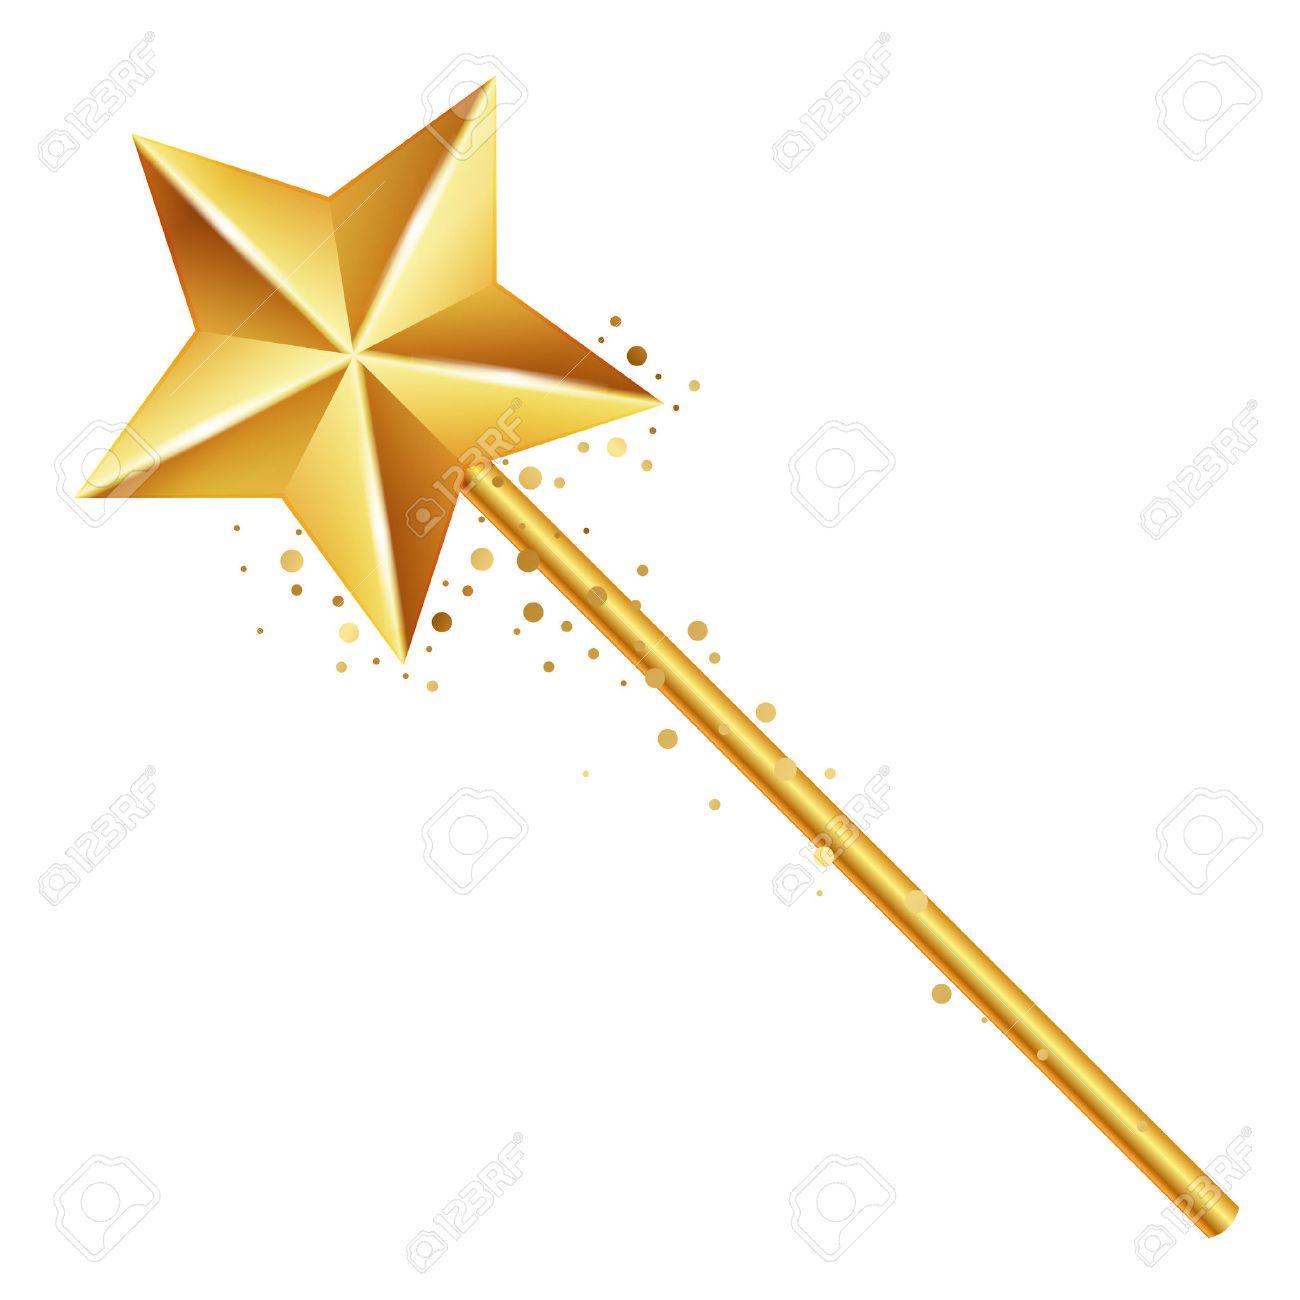 Vector illustration of golden magic wand - 22497124